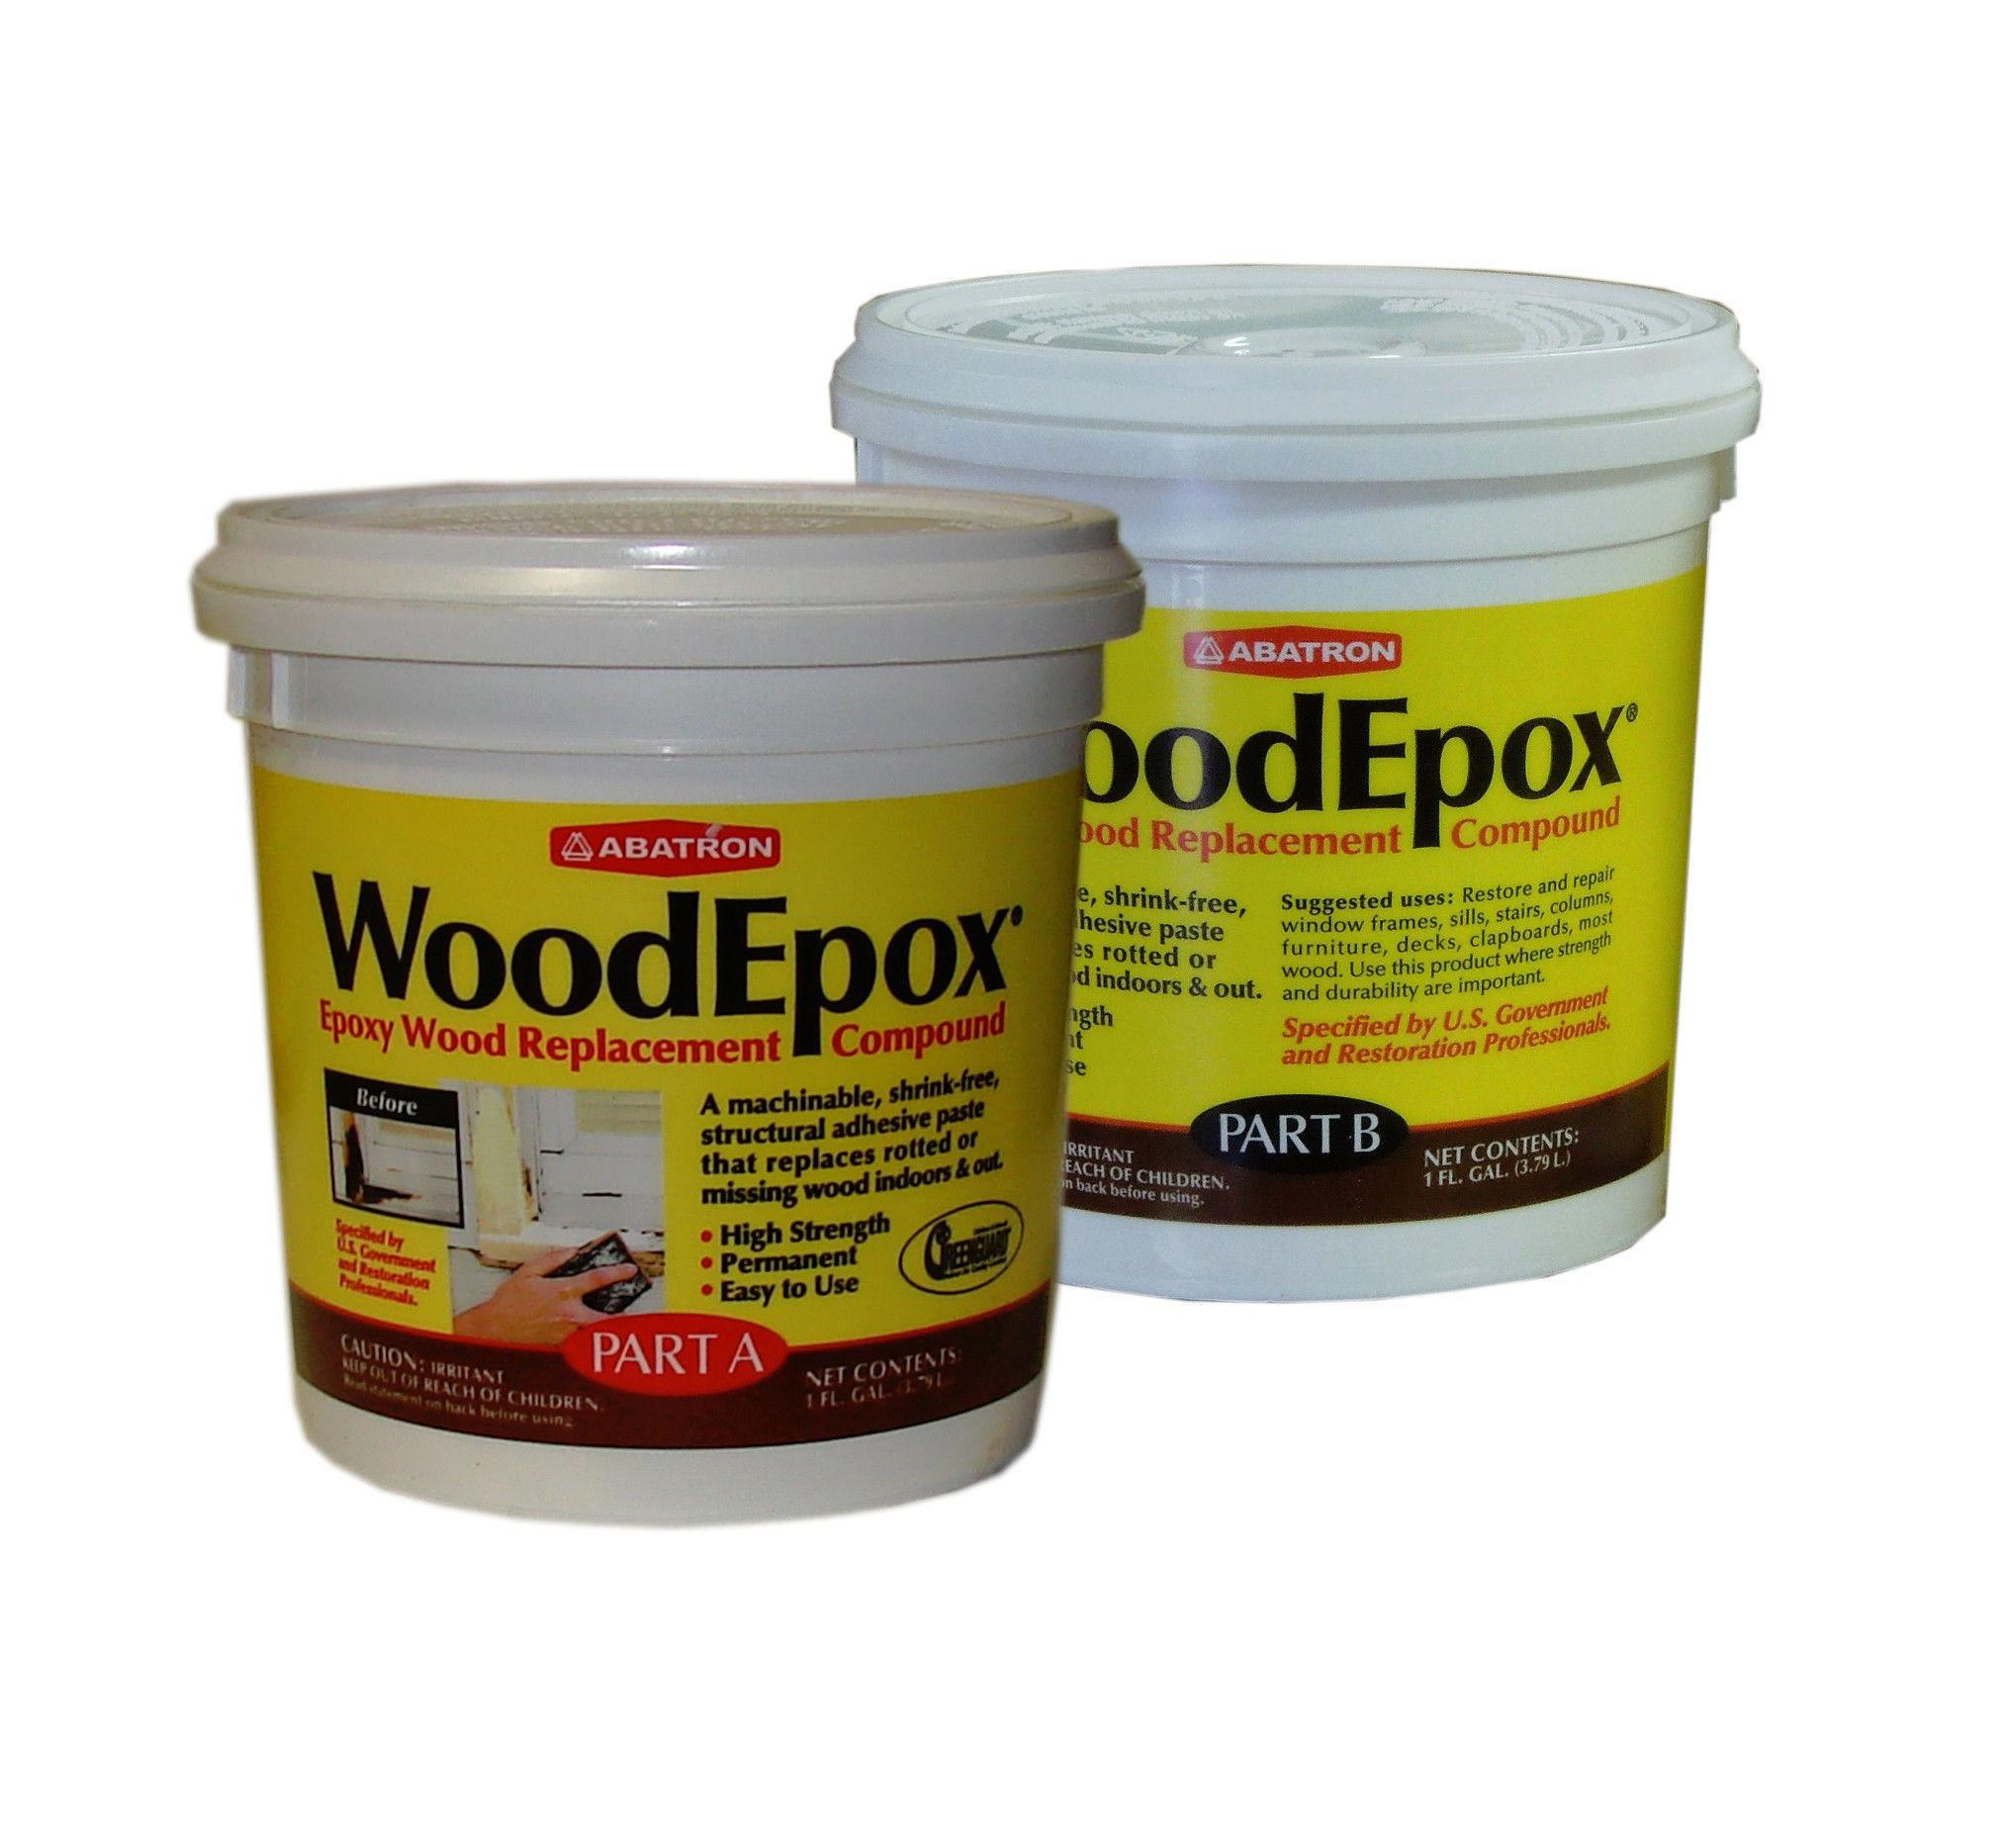 hardwood floor glue injection kit of sealants waterproofing coating tools more cmi serving the in abatron woodepox woodfiller historic wood restoration epoxy 2gal